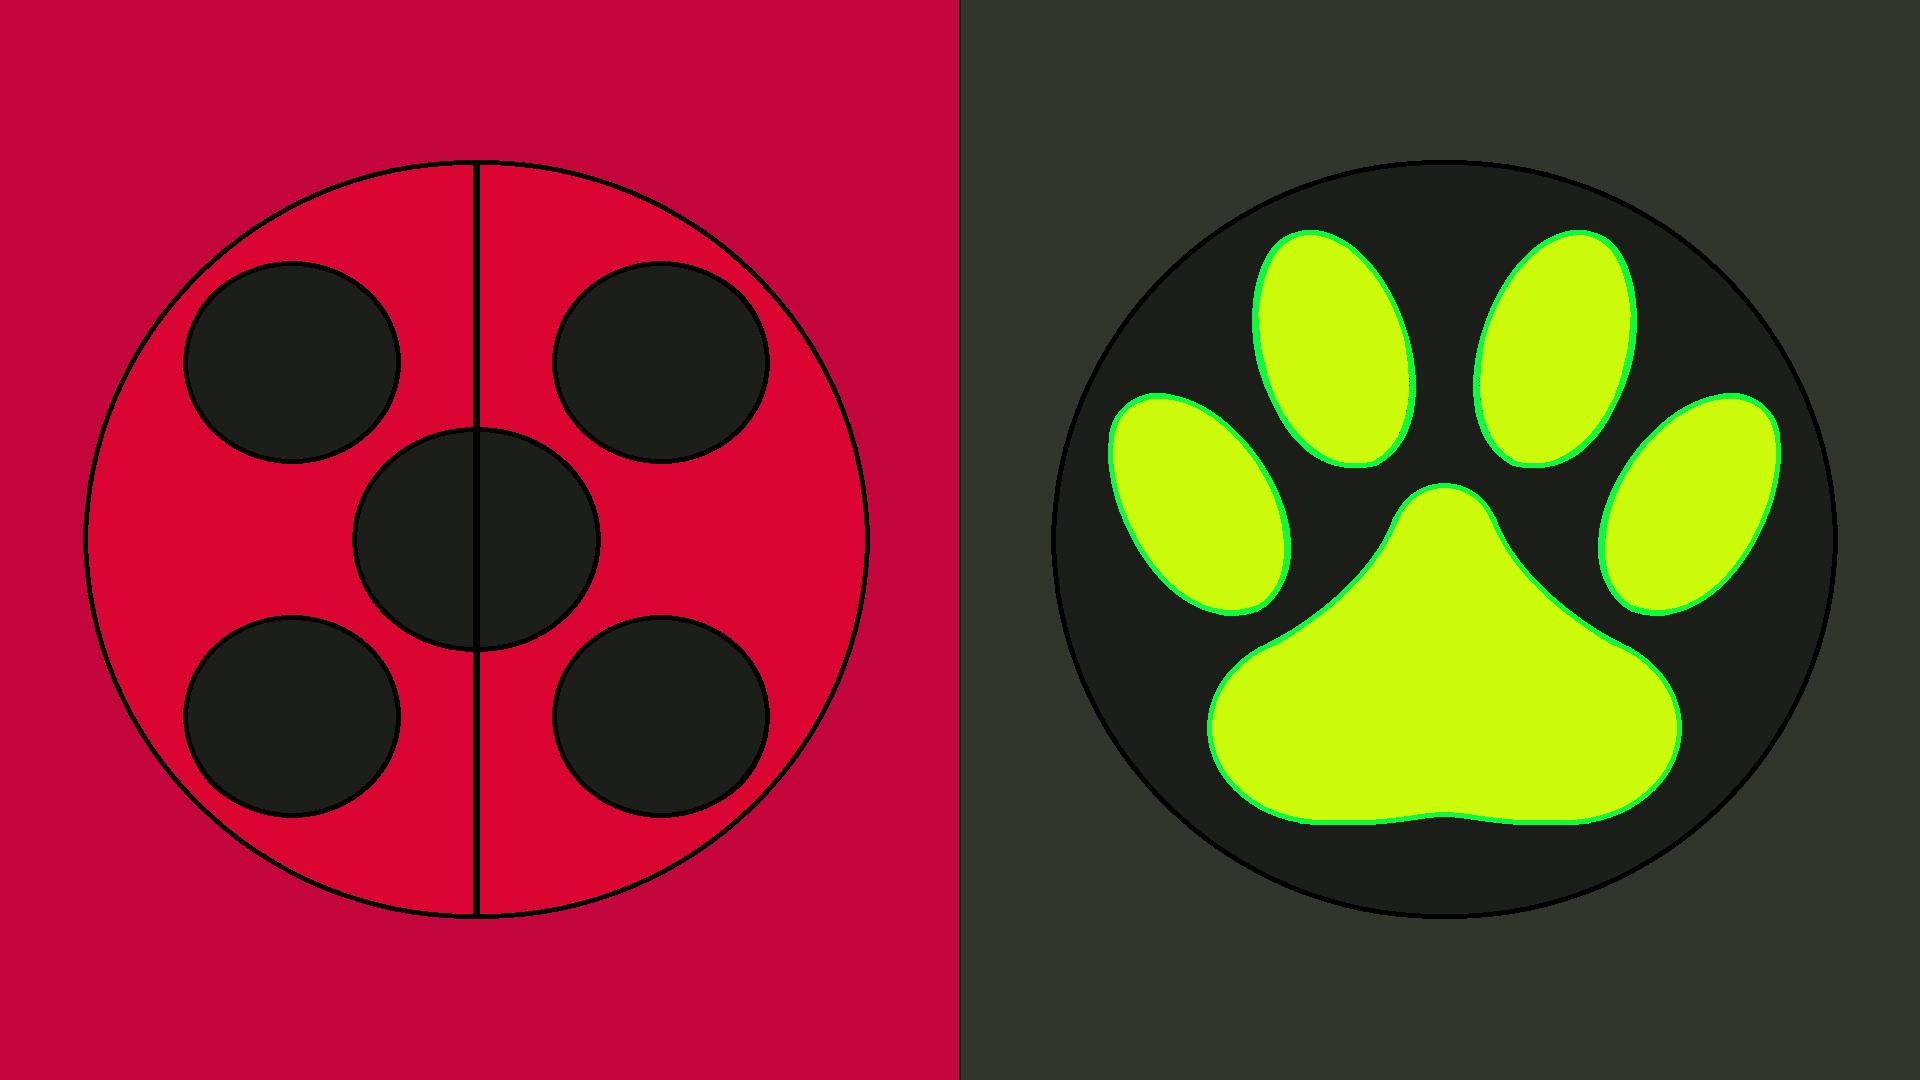 Miraculous Ladybug Cat Noir Wallpaper Ver 03 By Project Zaephys